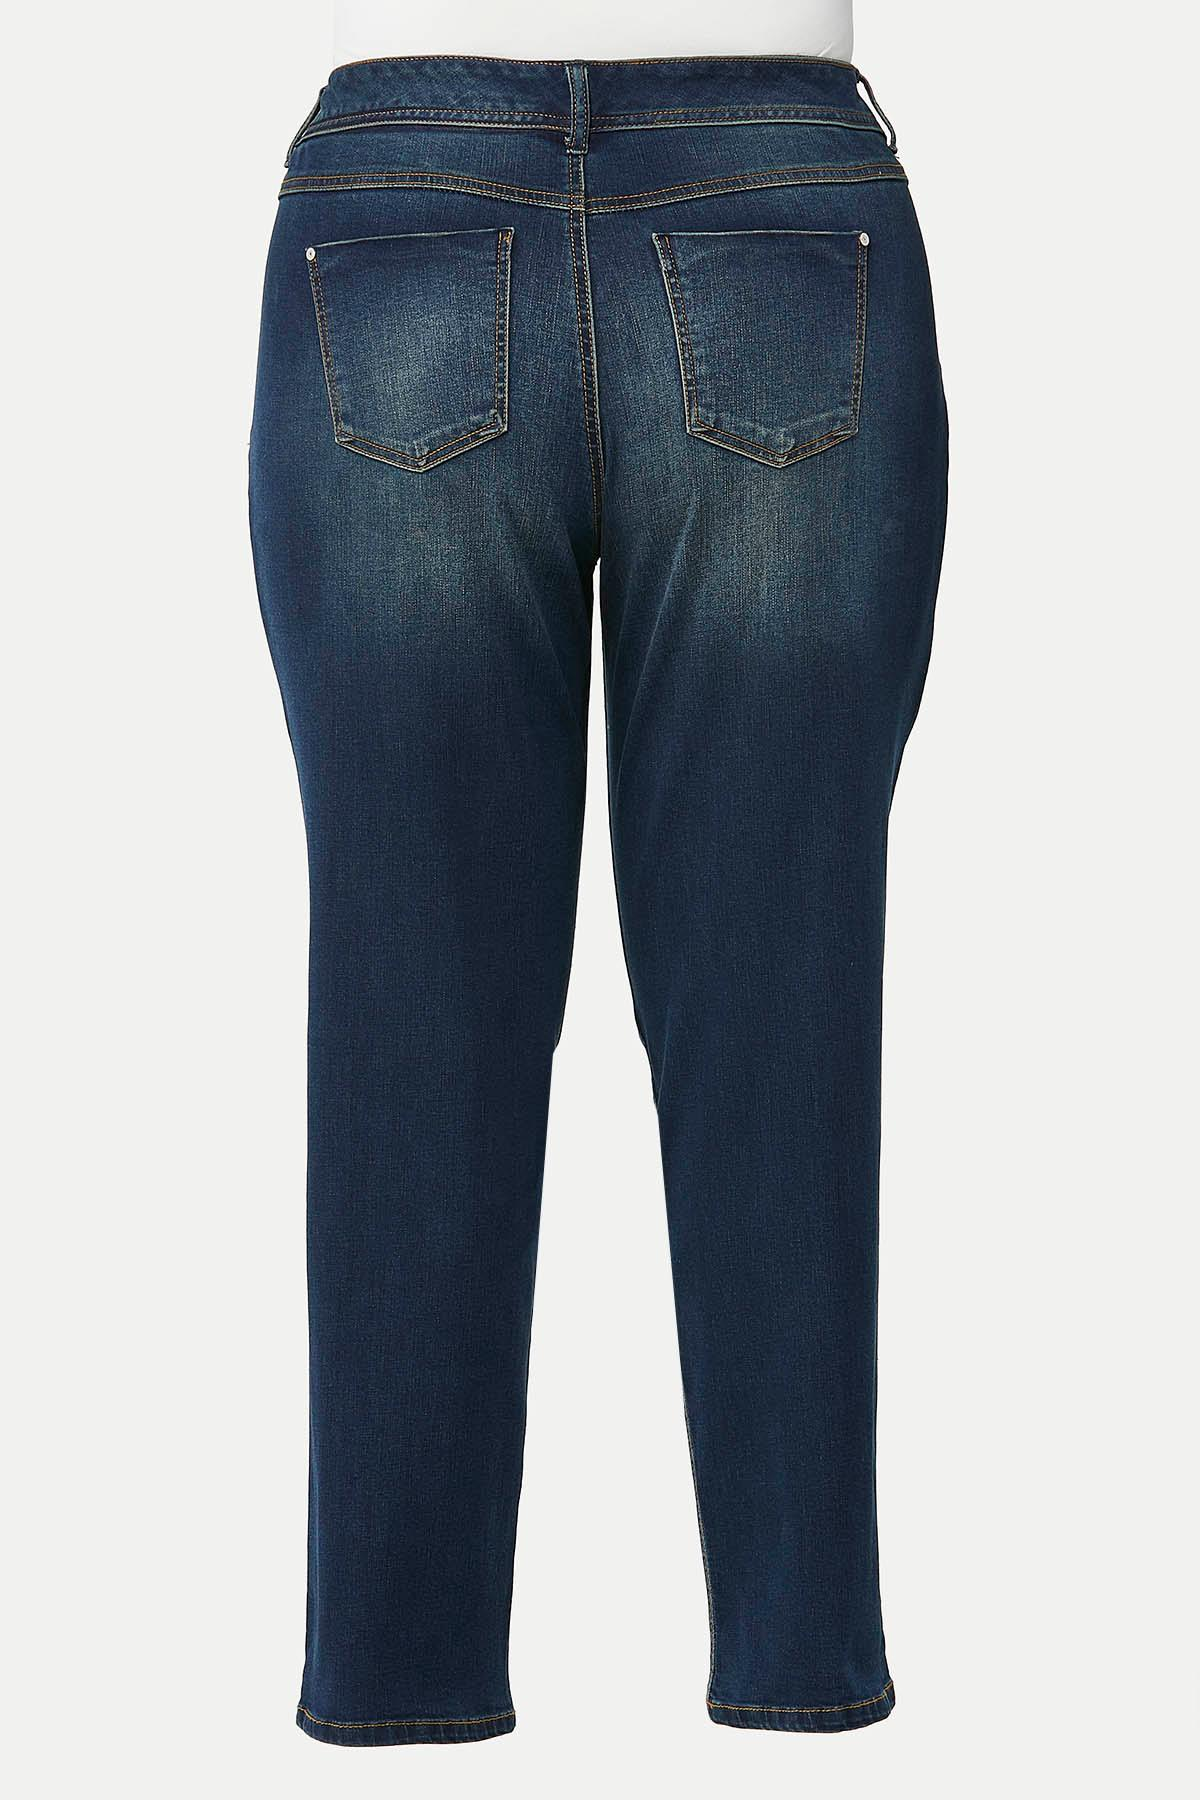 Plus Size Curvy Straight Leg Jeans (Item #44694048)